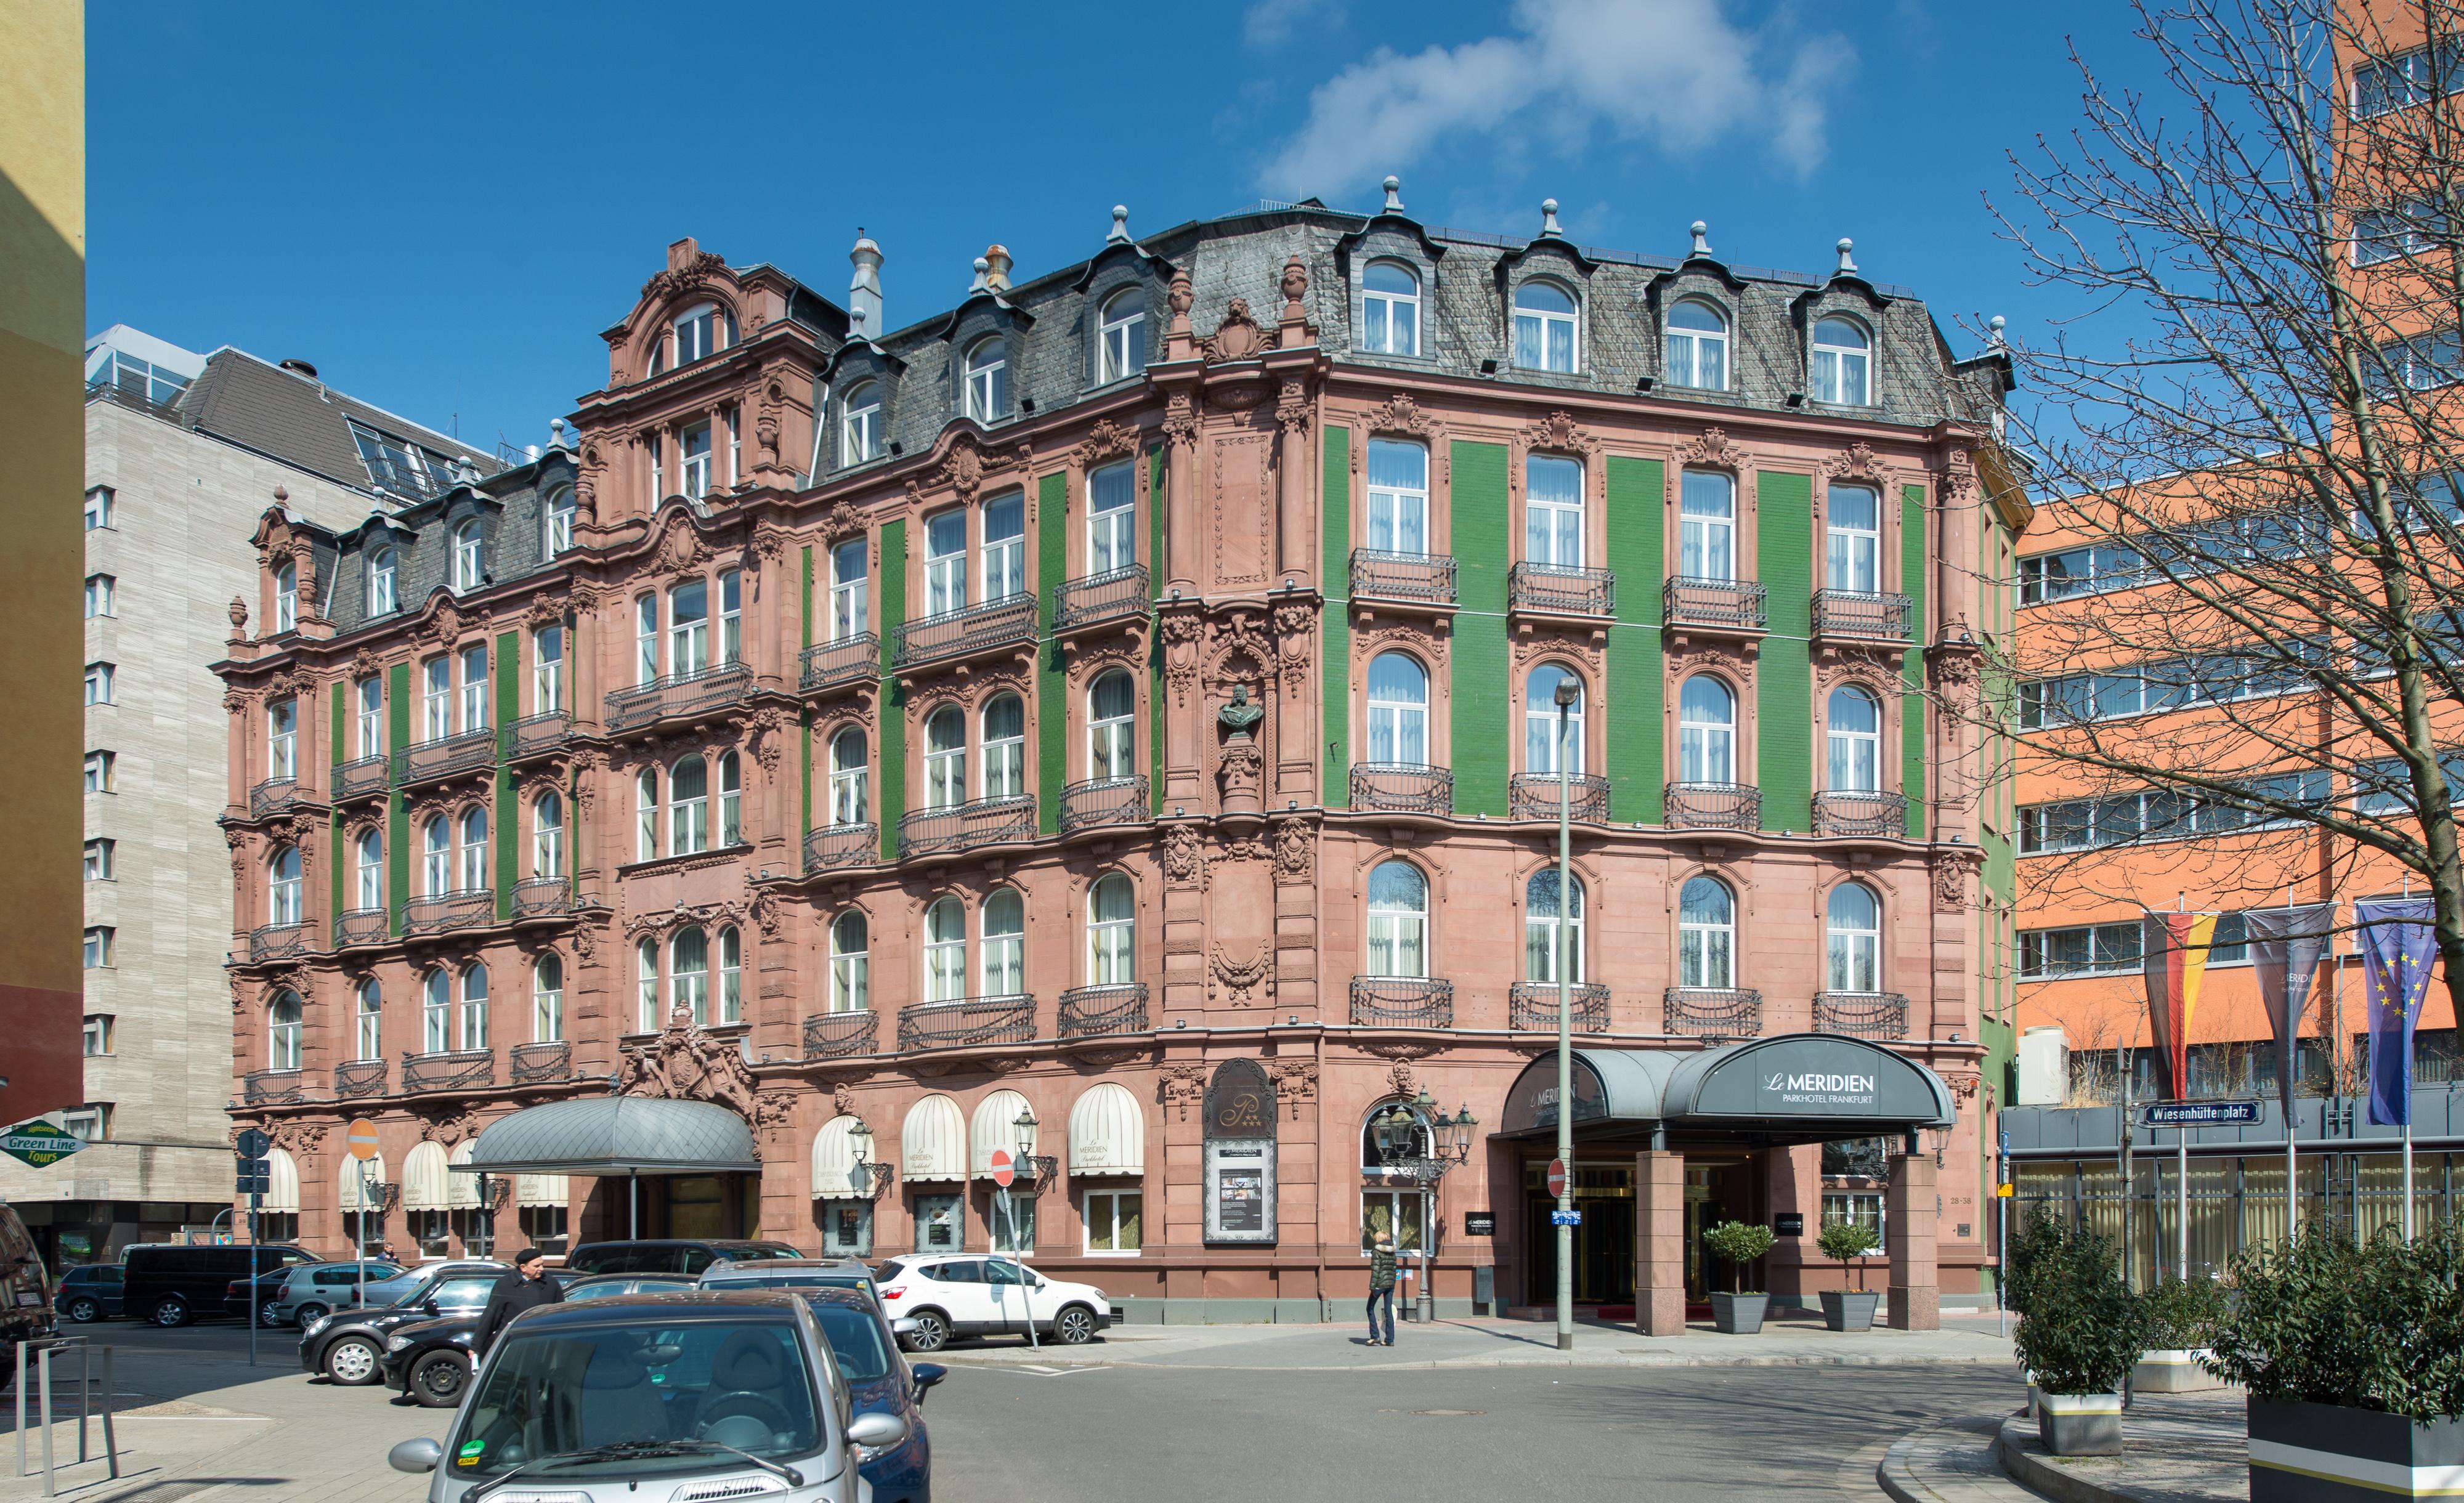 Frankfurt Hotel Mit Kind G Ef Bf Bdnstig